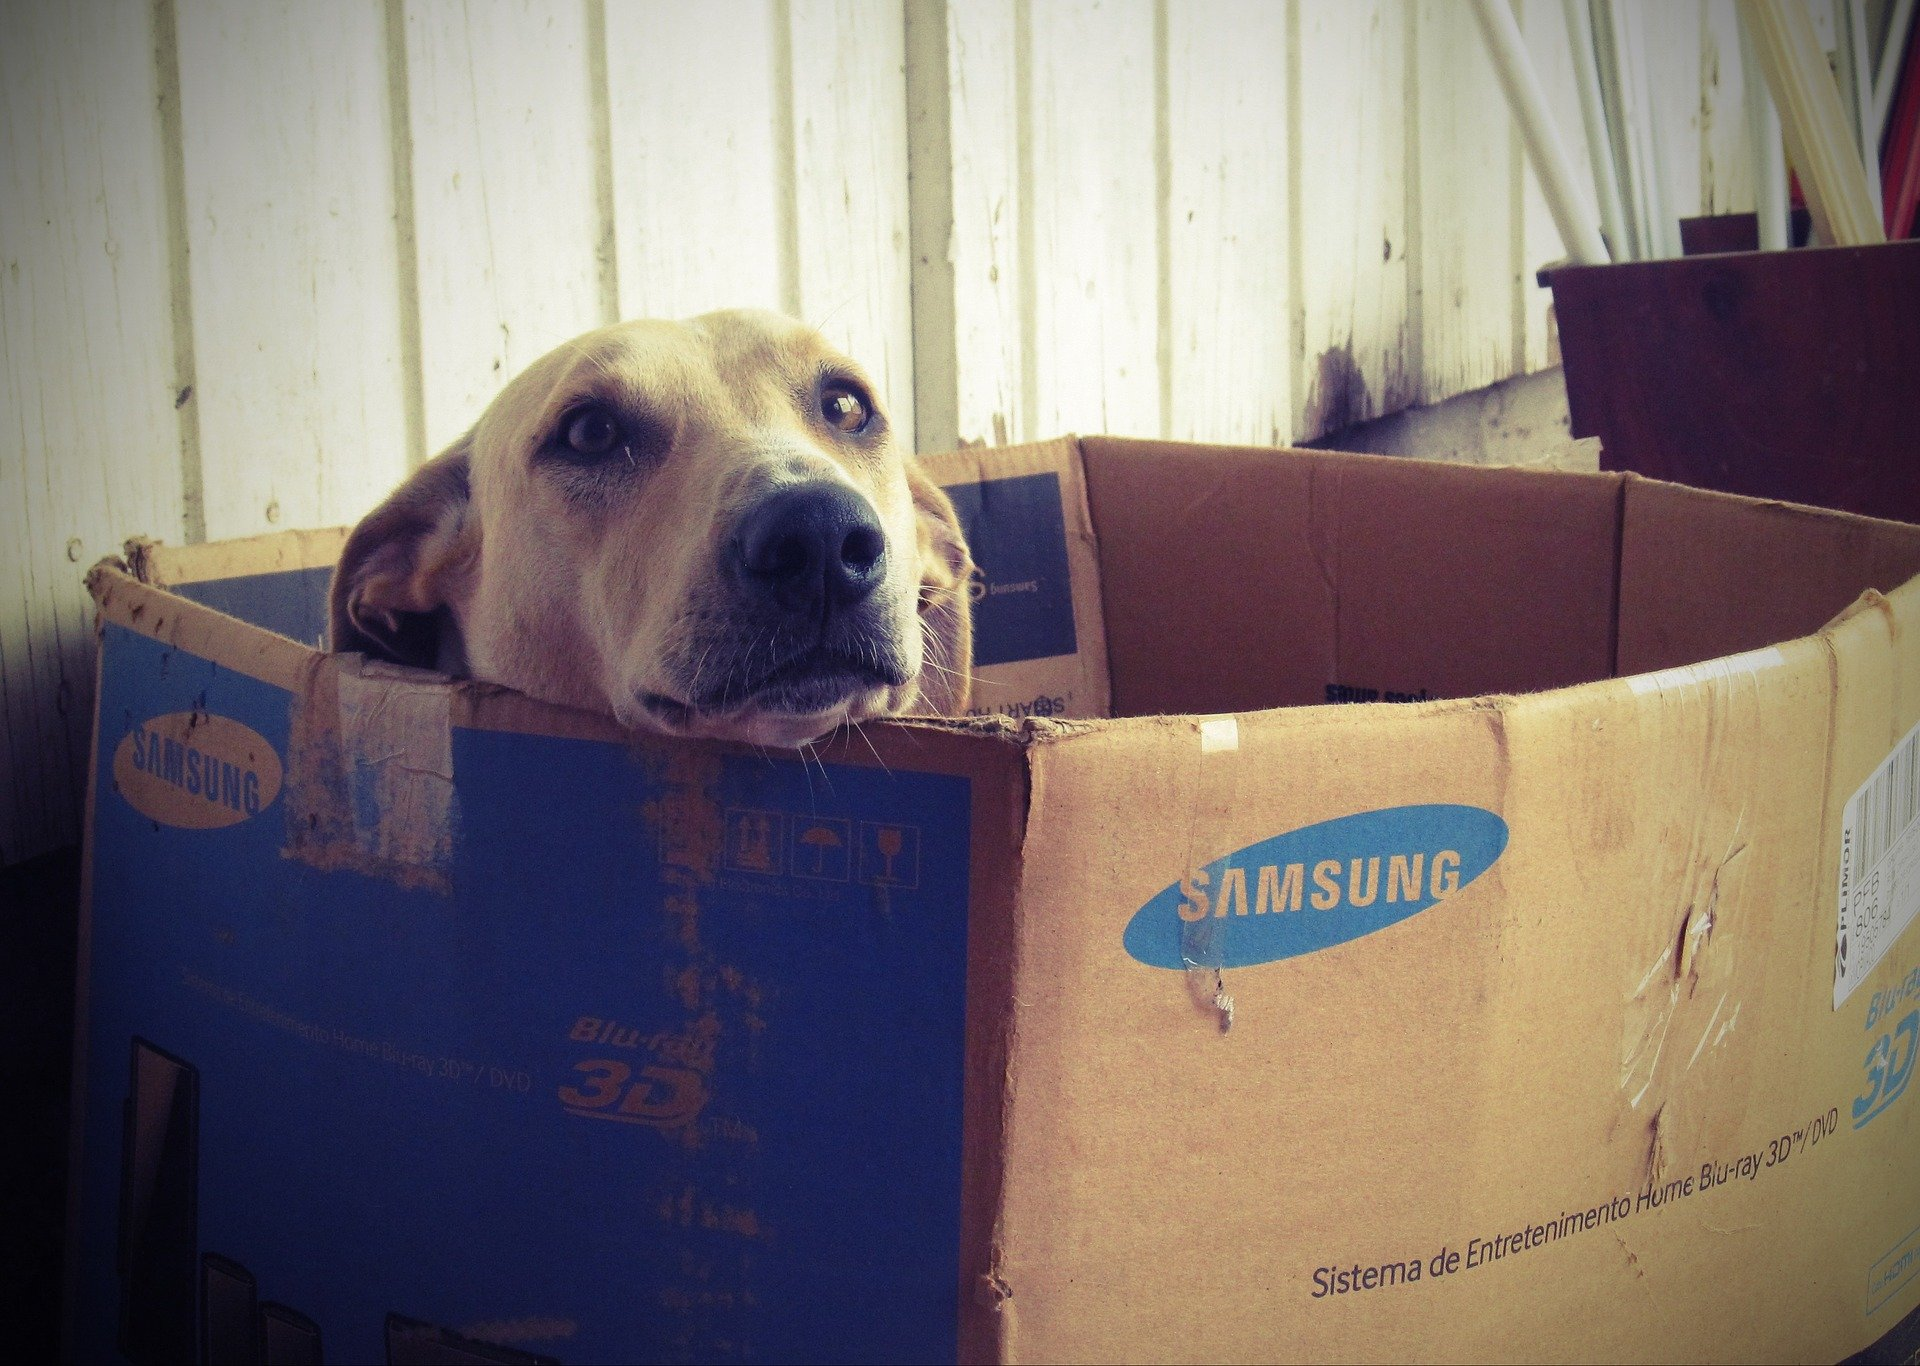 Samsung Galaxy S7: Profit steigt um 10 Prozent 2